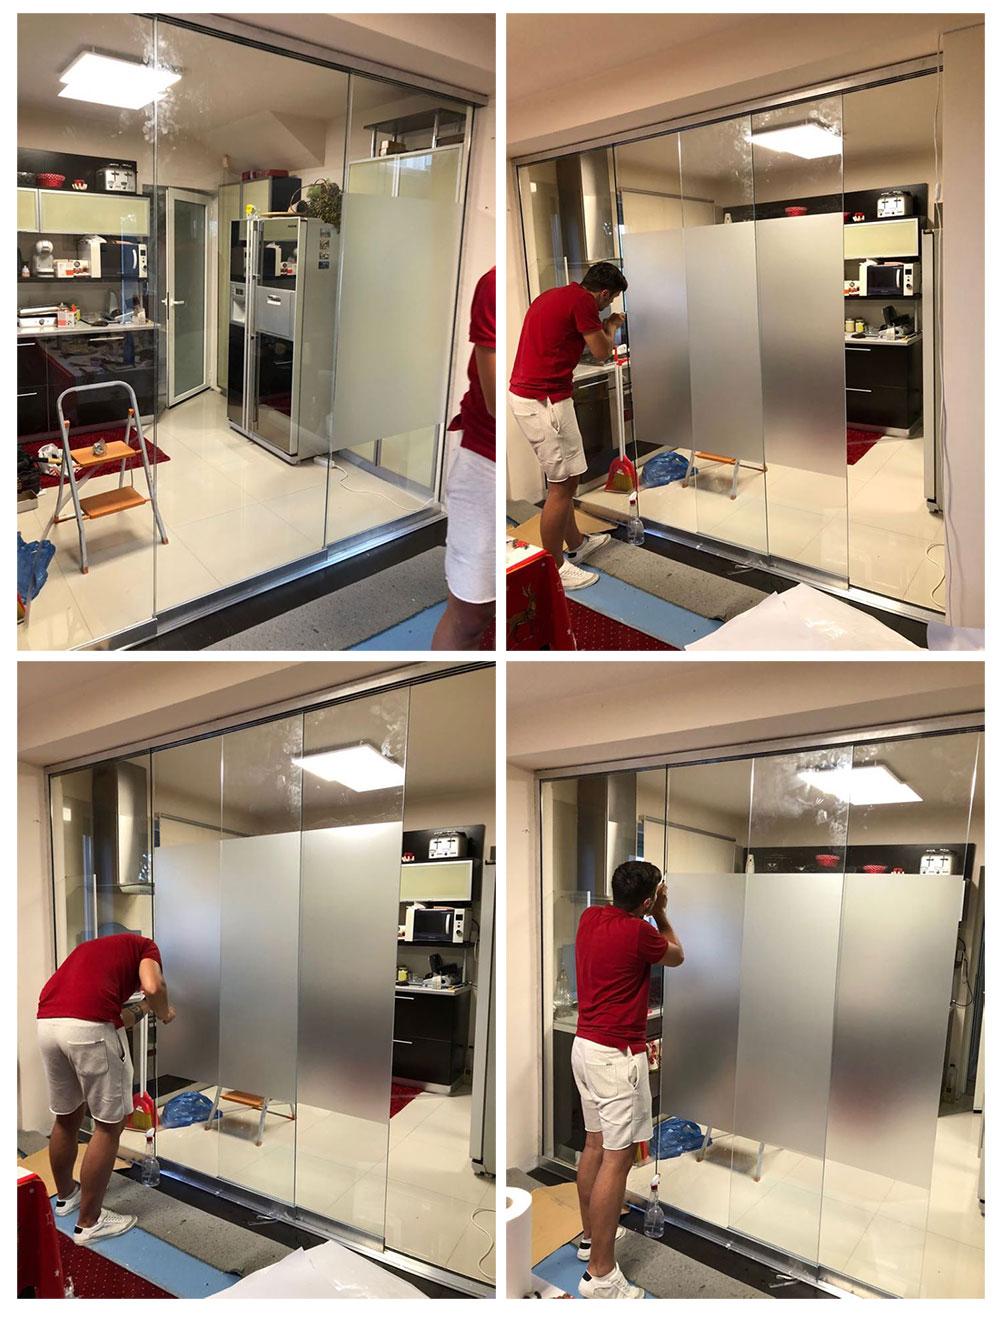 Separare bucatarie de livingcu sticla securizata glisanta